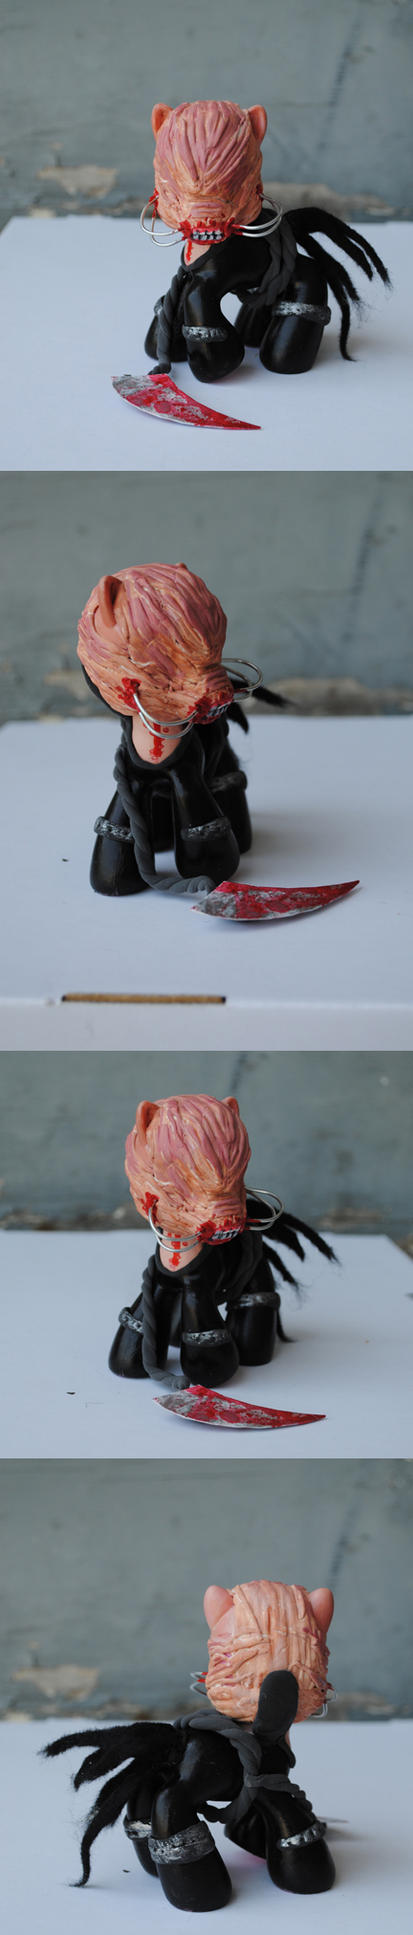 My Little Pony Cenobite by Tat2ood-Monster